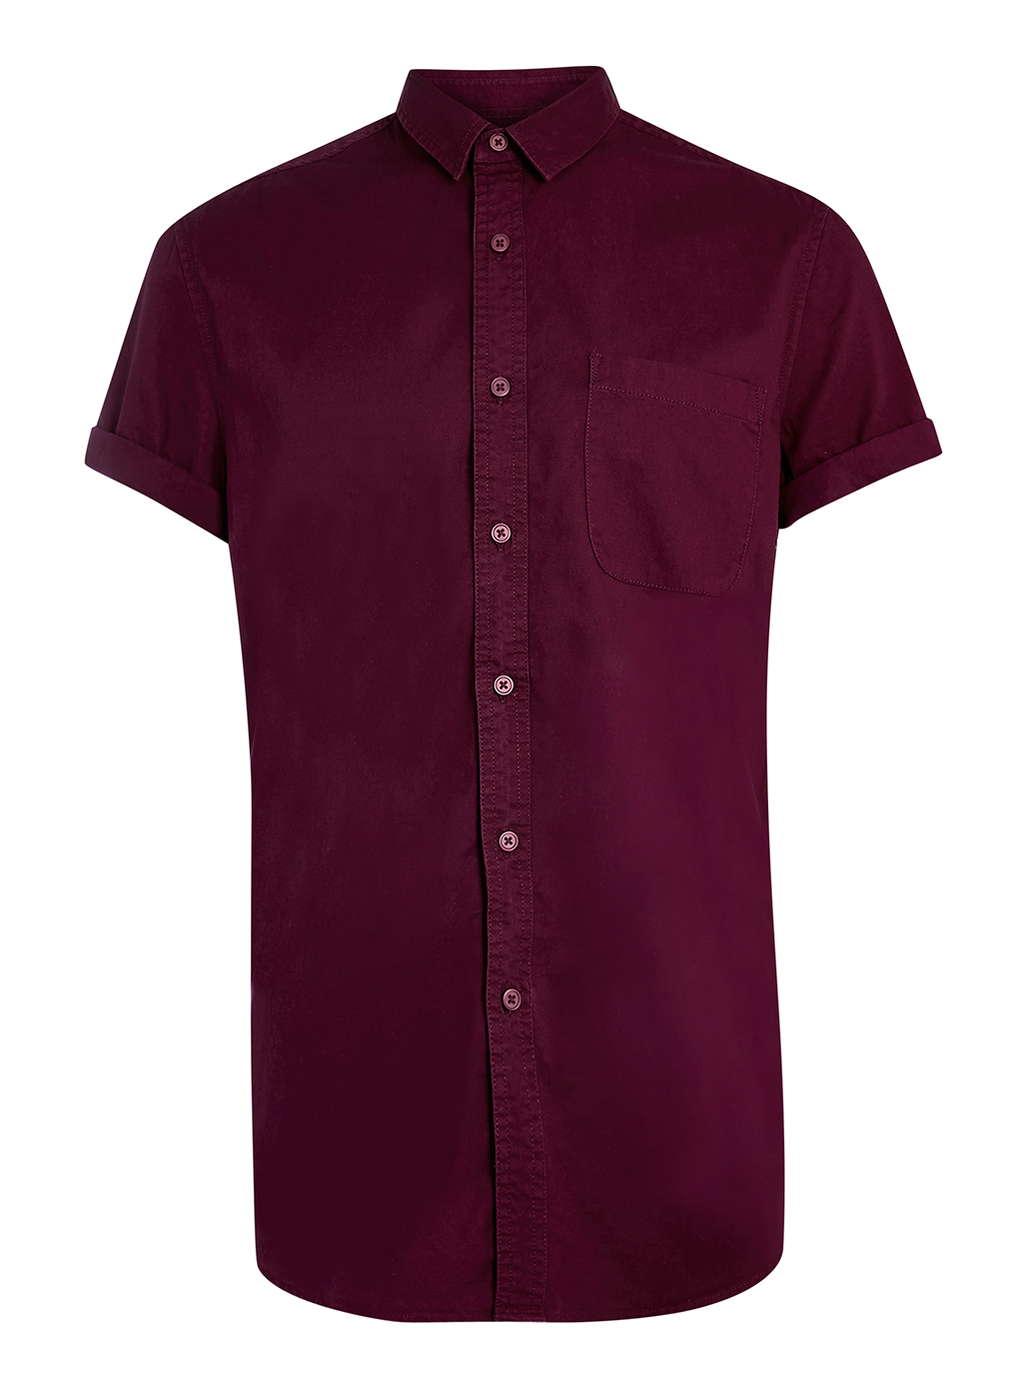 Topman washed burgundy short sleeve casual twill shirt in for Short sleeve casual shirt